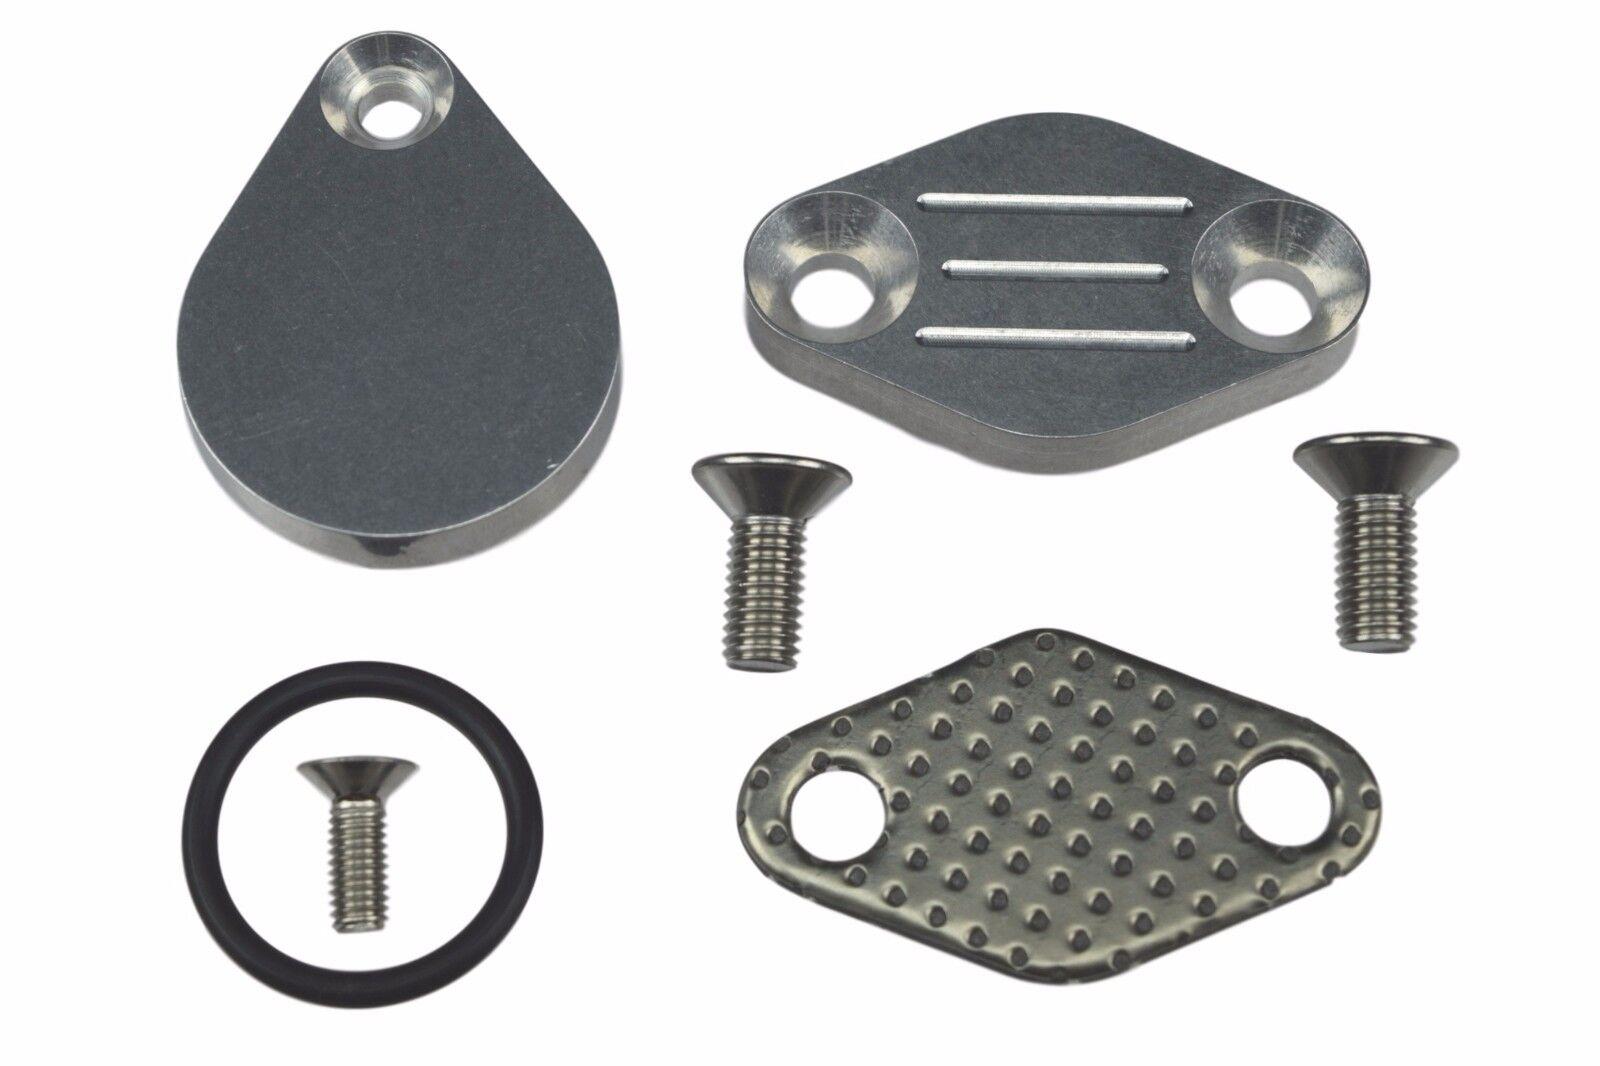 LS EGR Delete Intake//Exhaust Block Off Plate LSX Silverado 4.8L 5.3L 6.0L LQ4